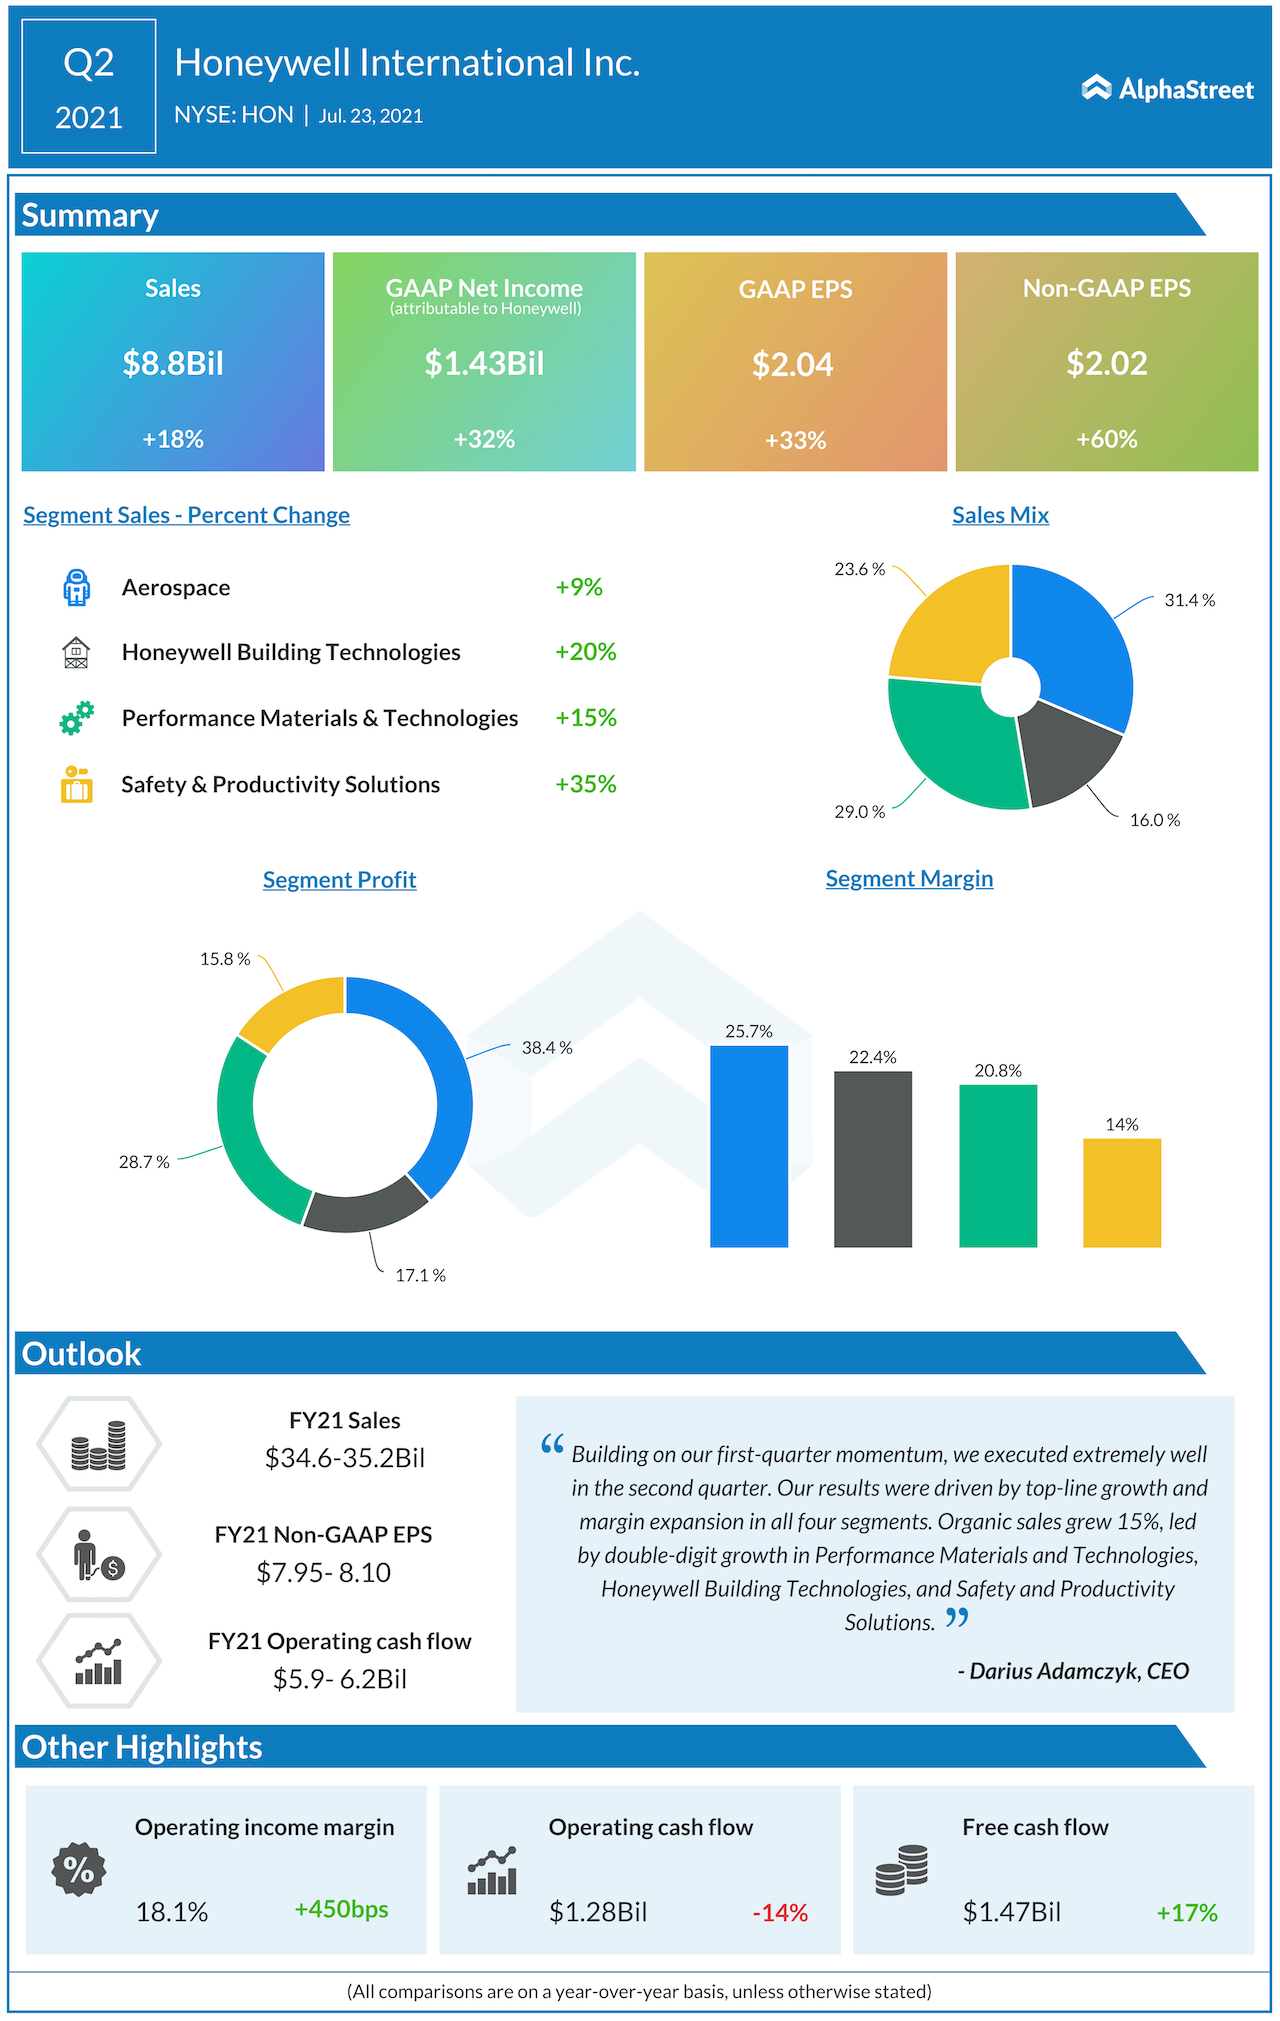 Honeywell International Q2 2021 earning